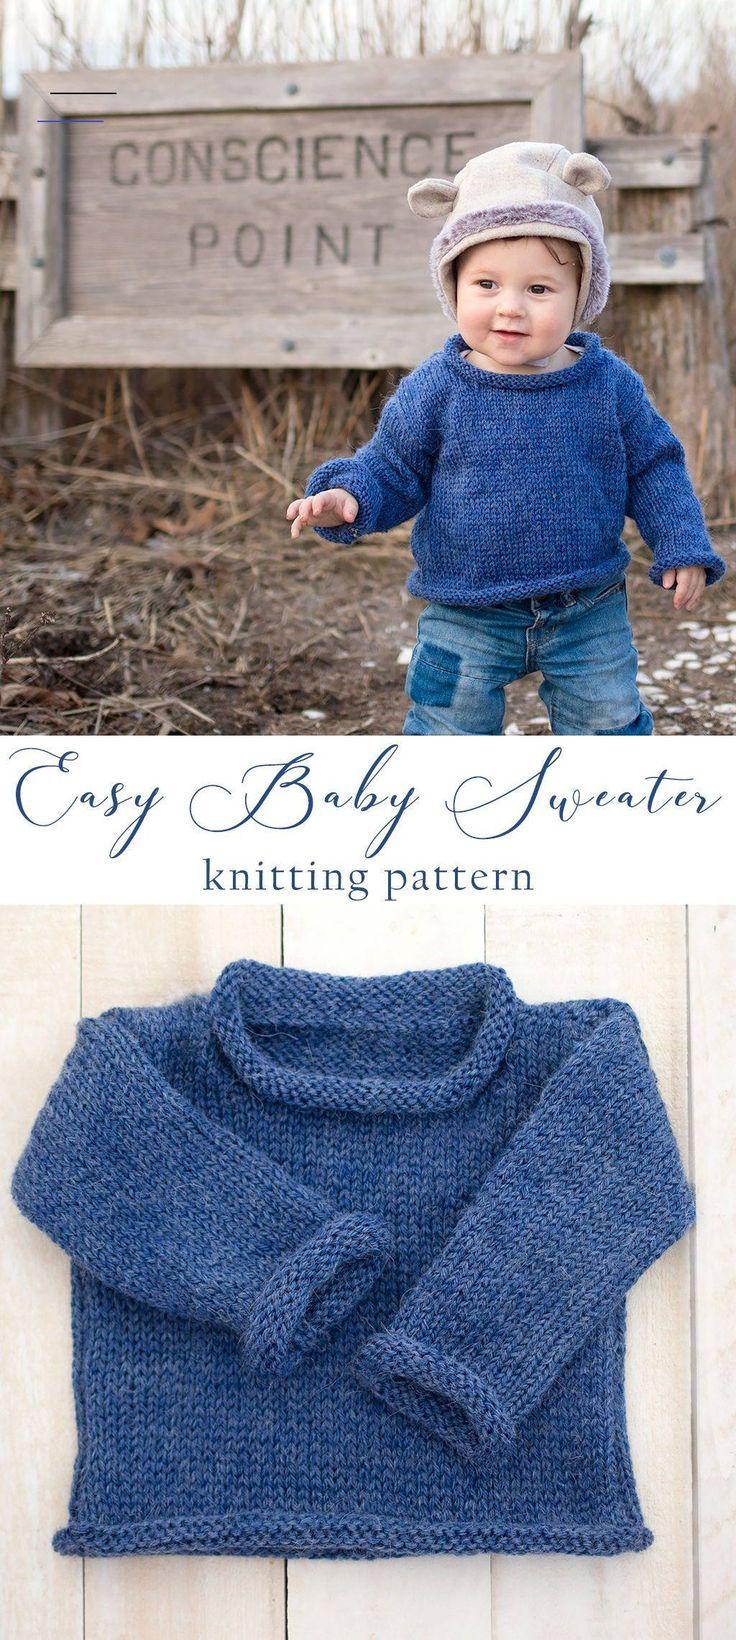 Easy Baby Sweater Knitting Pattern - Gina Michele - # ...